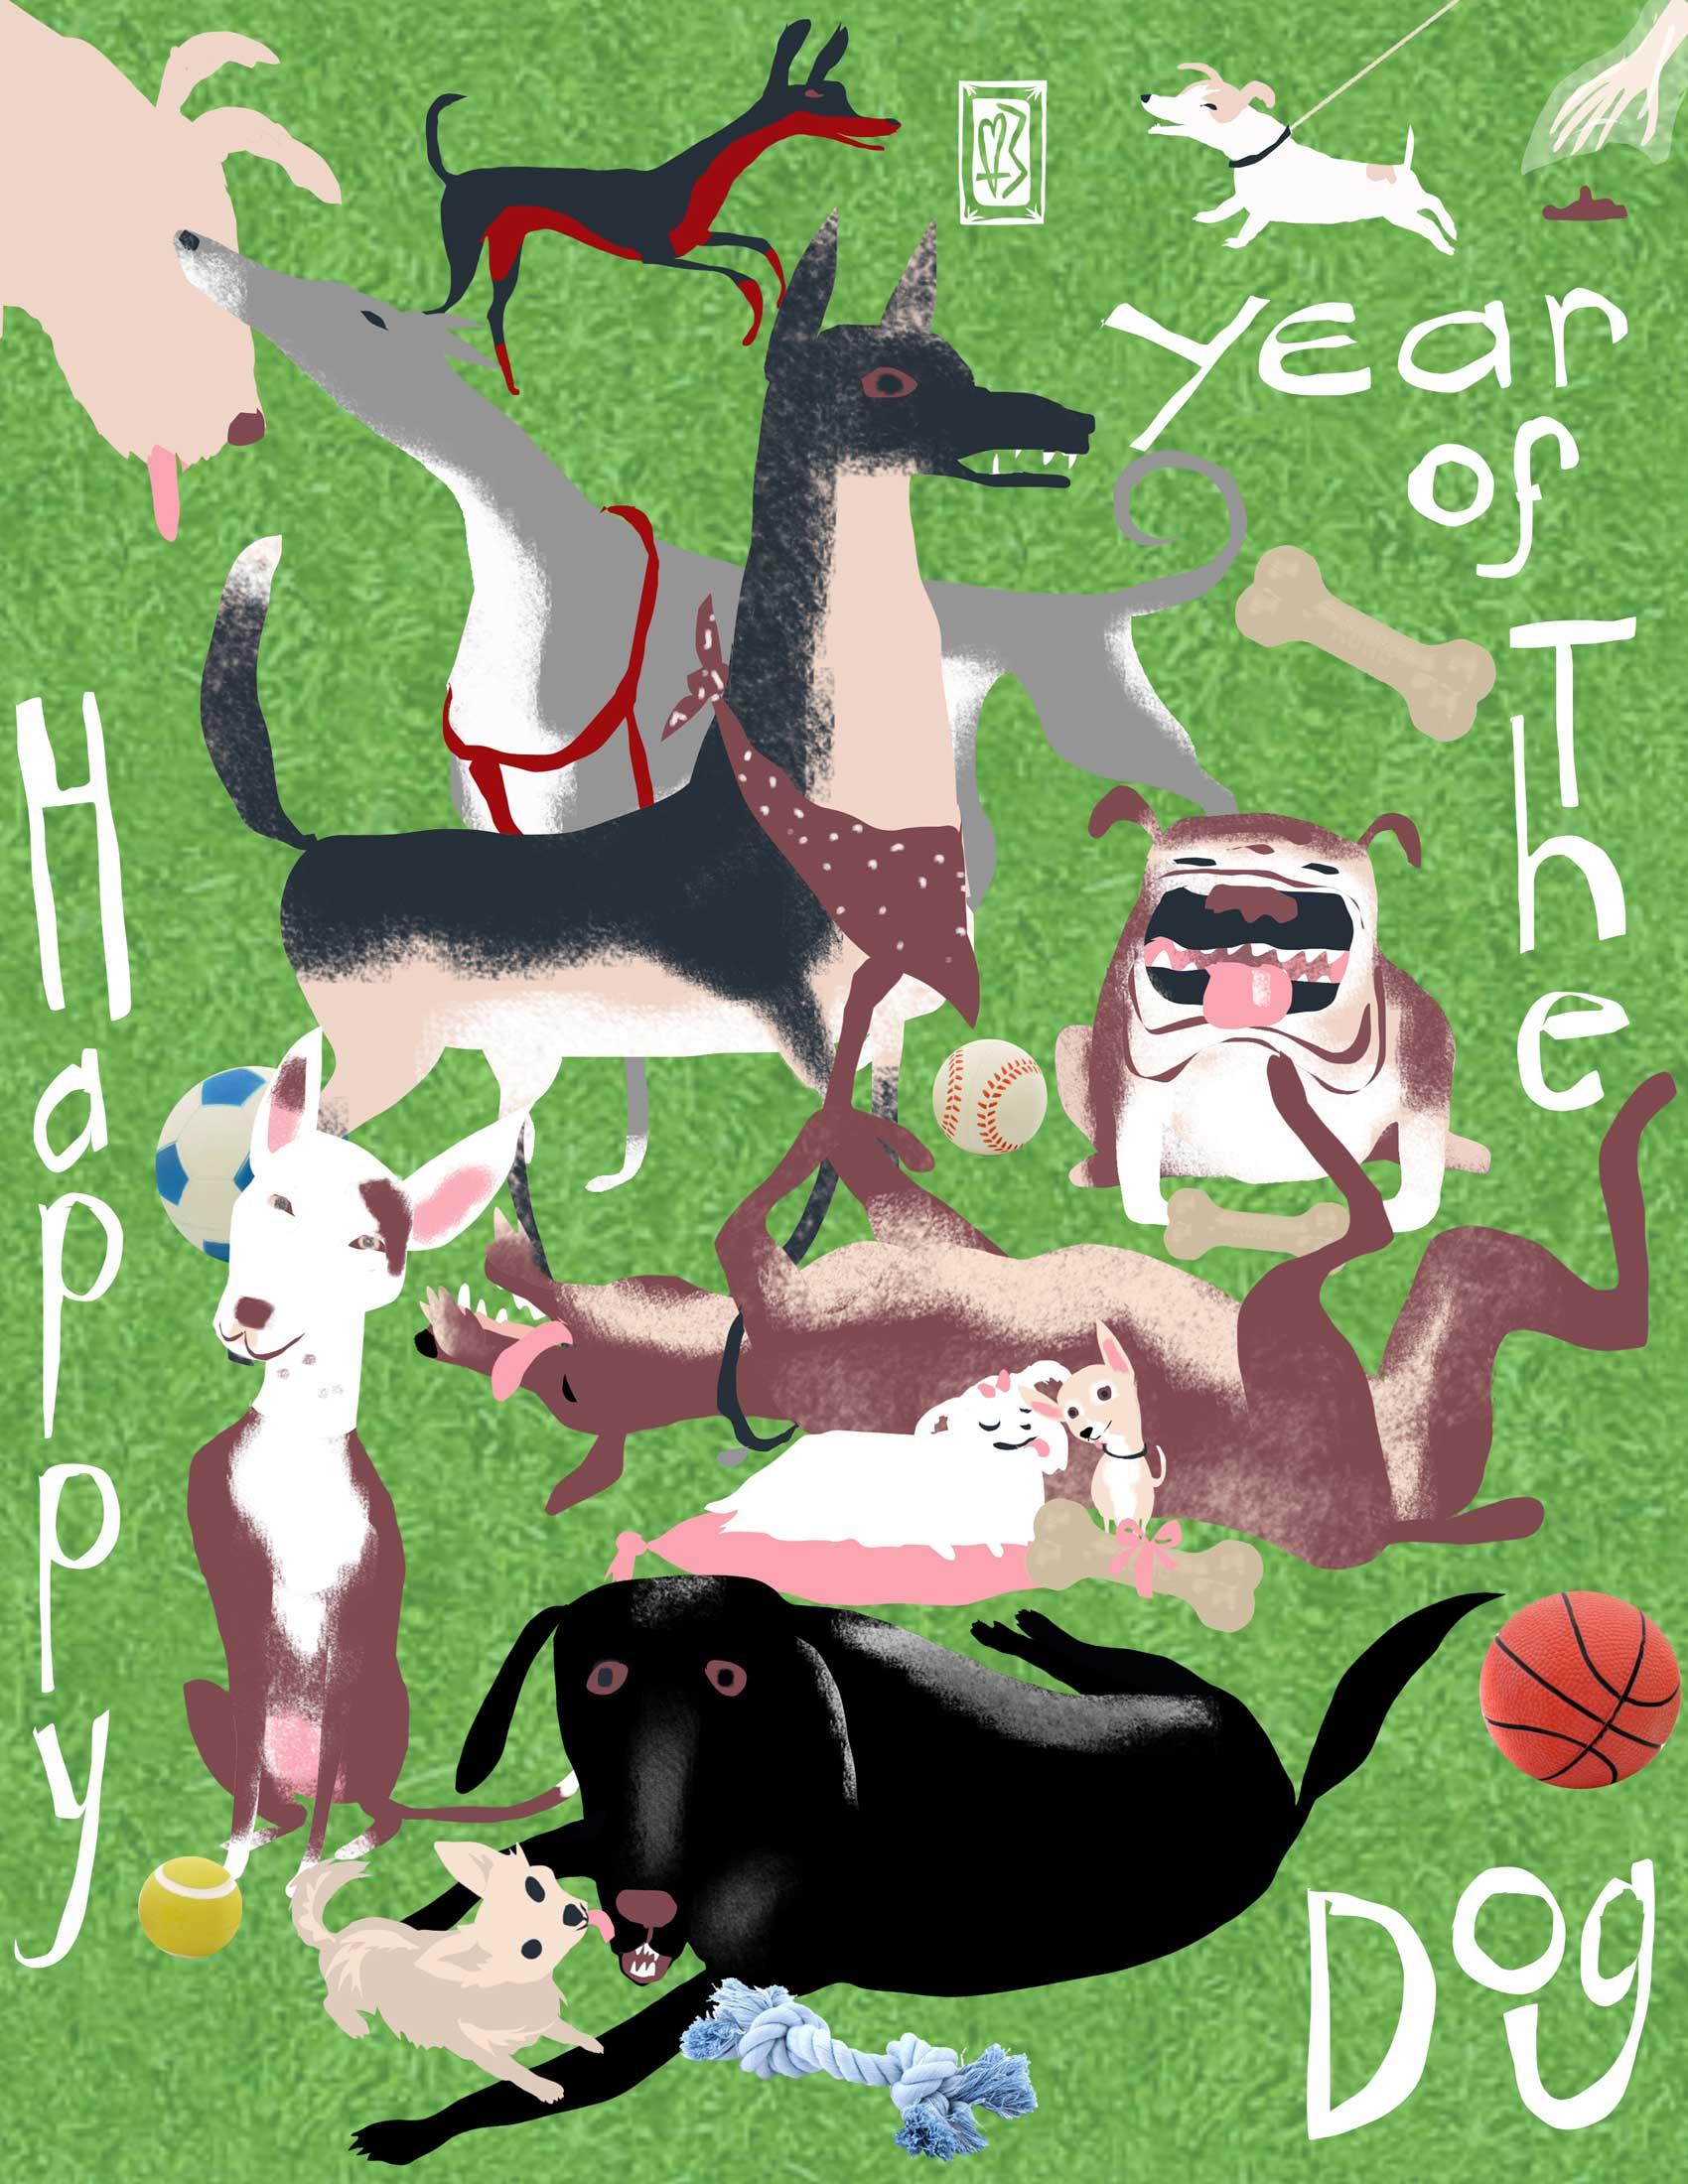 year-of-the-dog.jpg